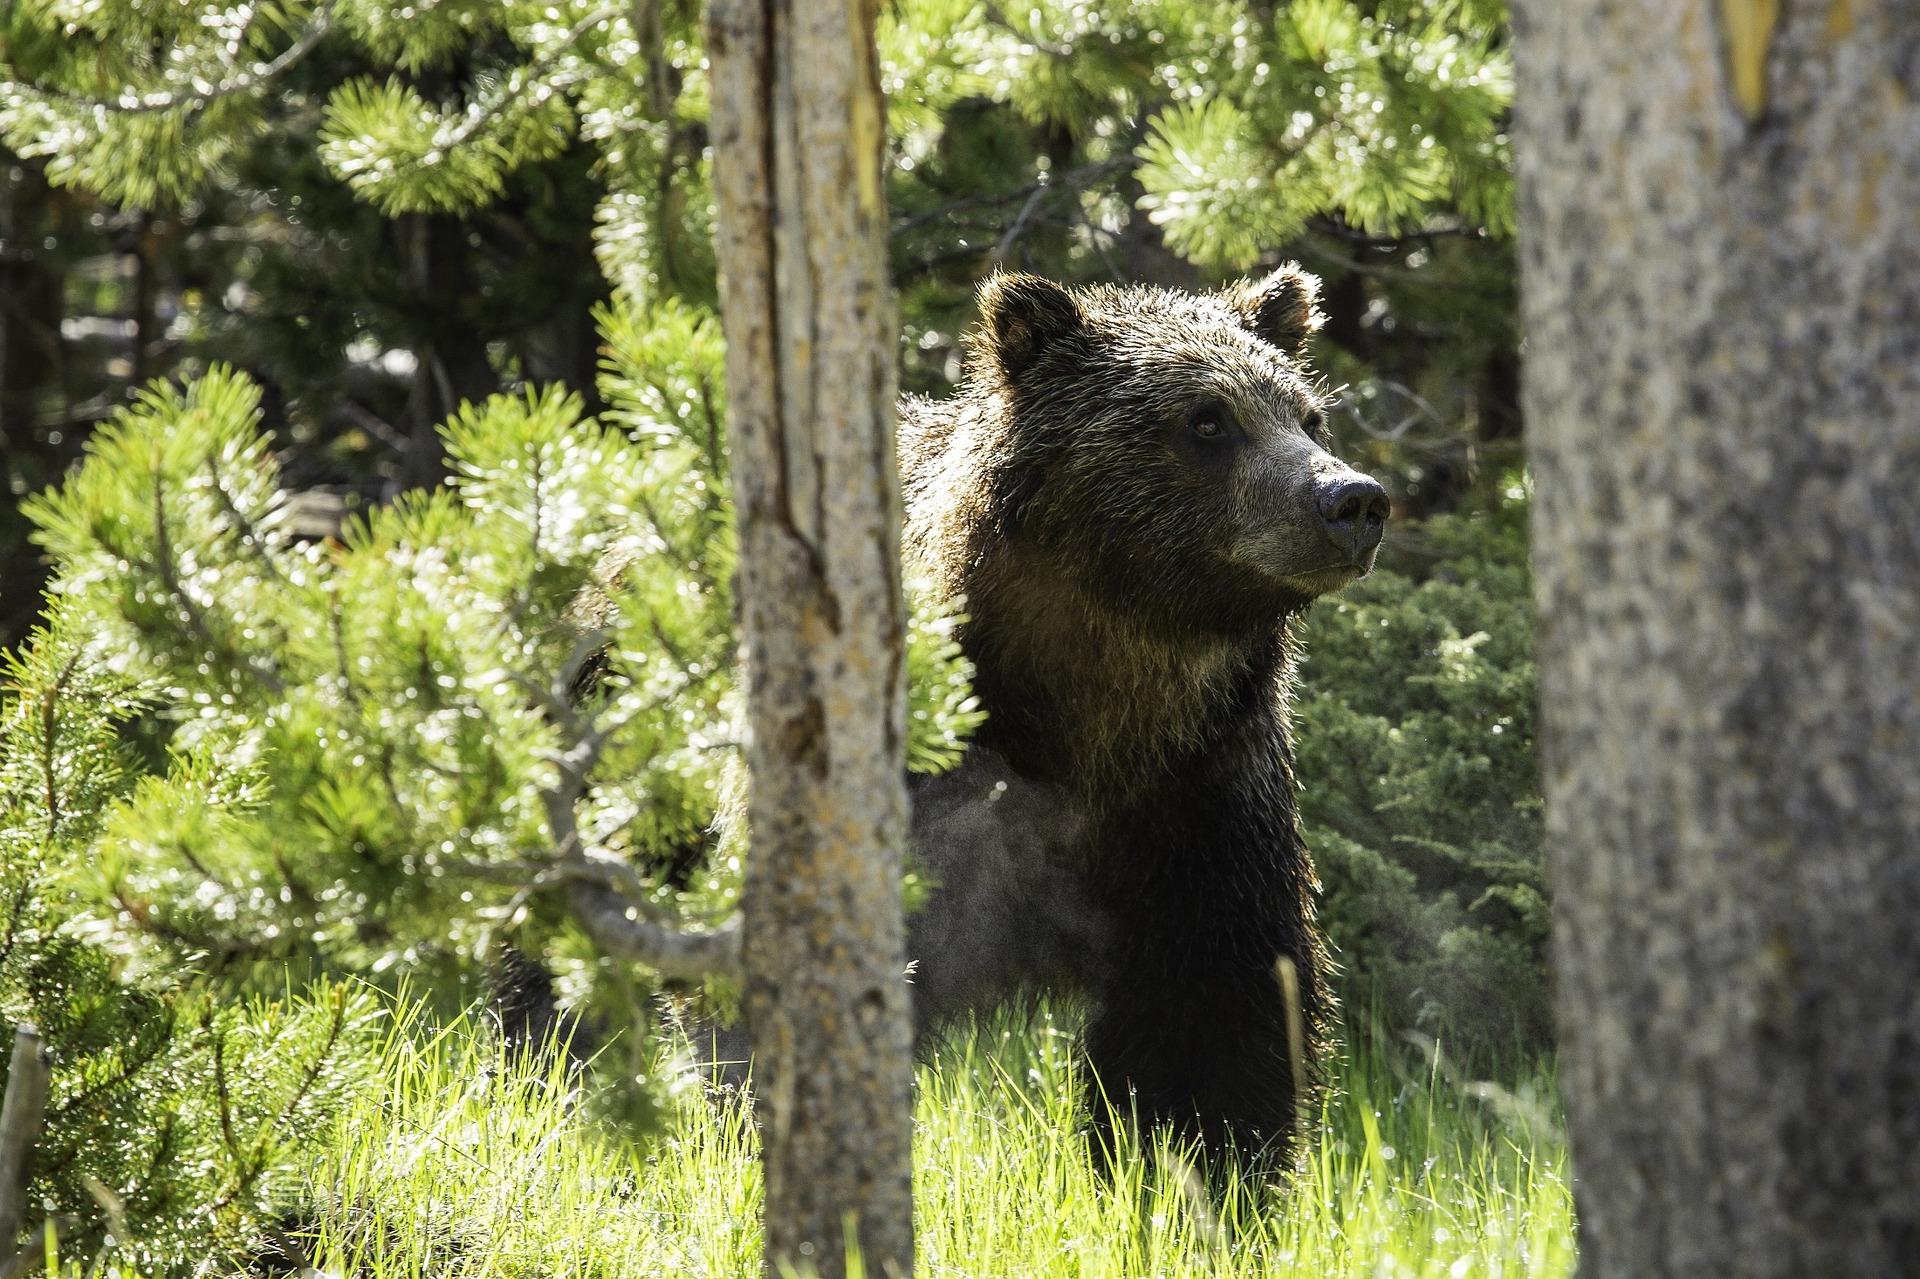 https://ewacetera.pl/wp-content/uploads/2017/08/grizzly-bear-1058750_1920.jpg